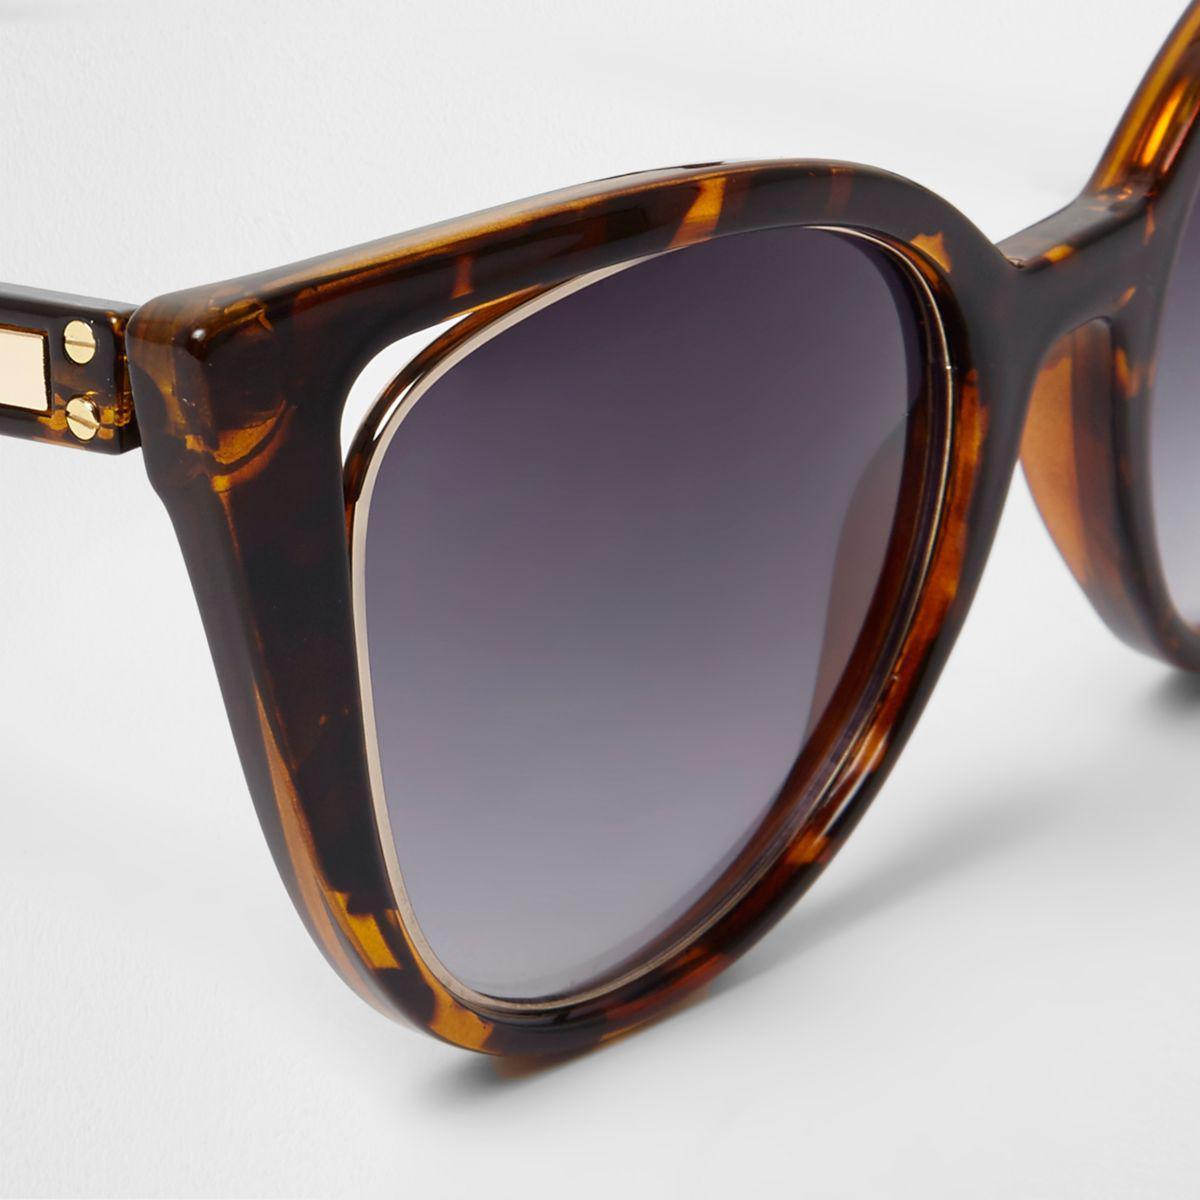 River Island Brown Tortoiseshell Cat Eye Sunglasses Brown Tortoiseshell Cat Eye Sunglasses